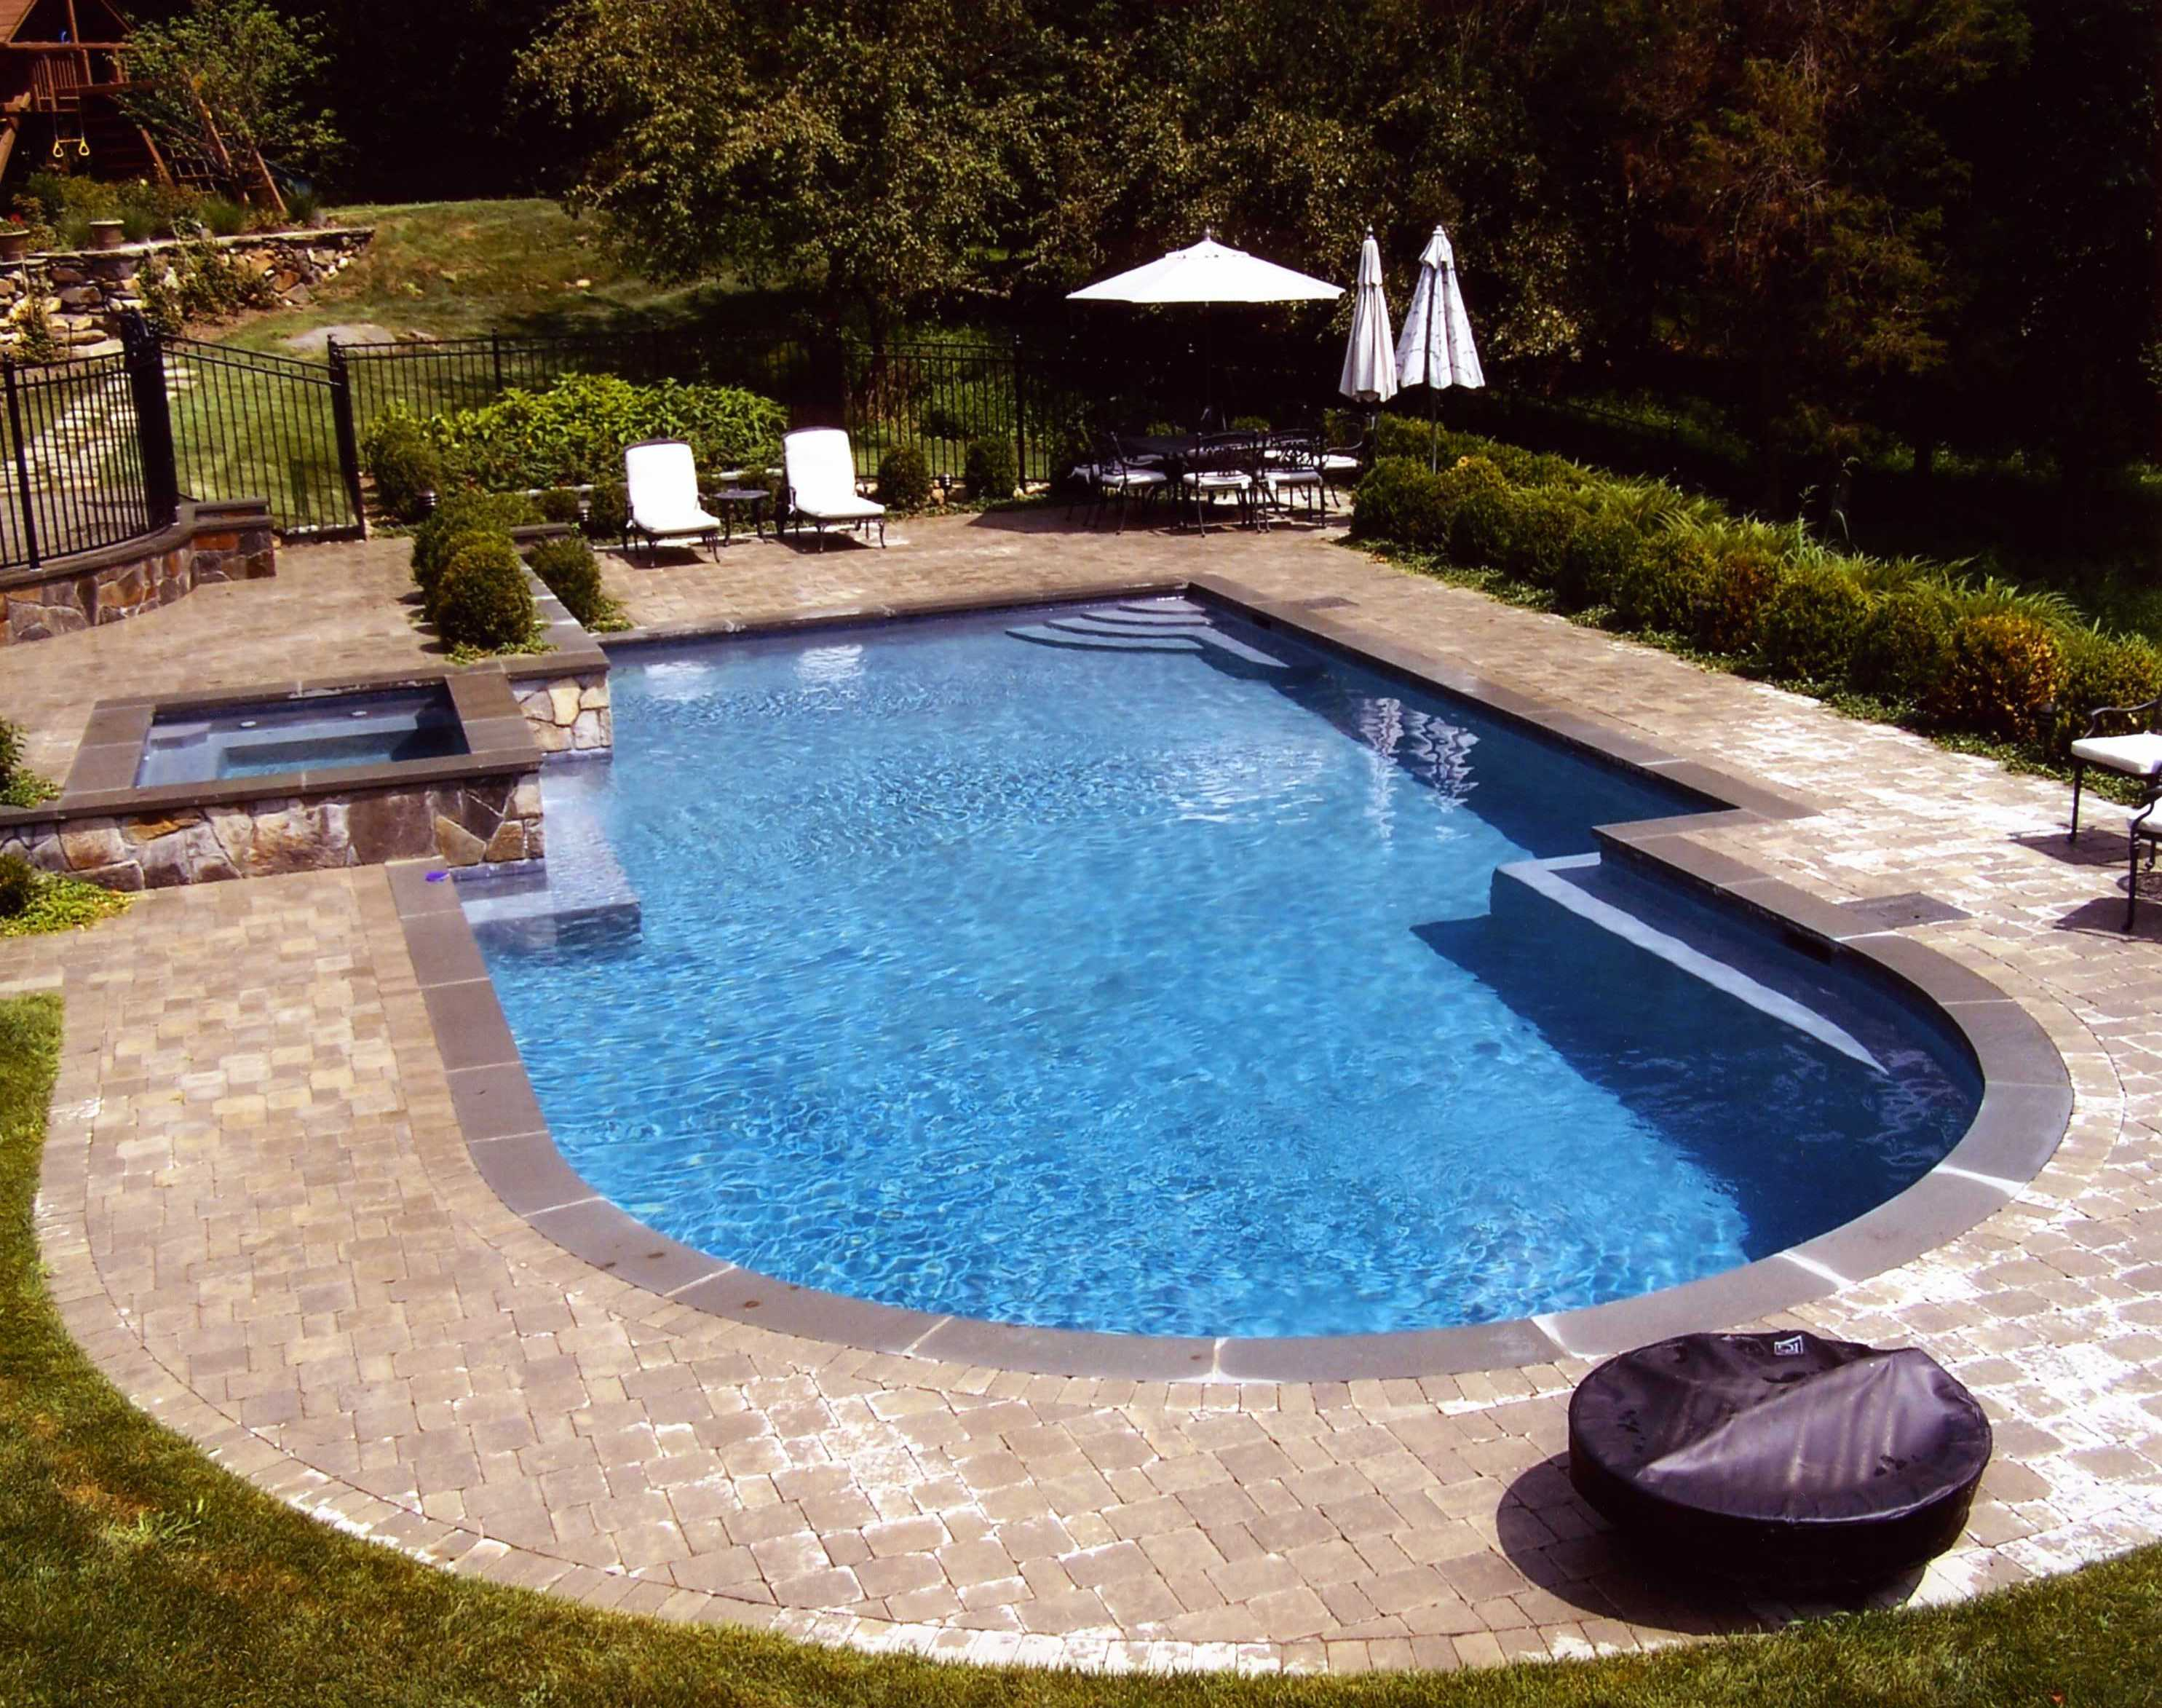 Swimming Pool Design for Your Beautiful Yard - HomesFeed